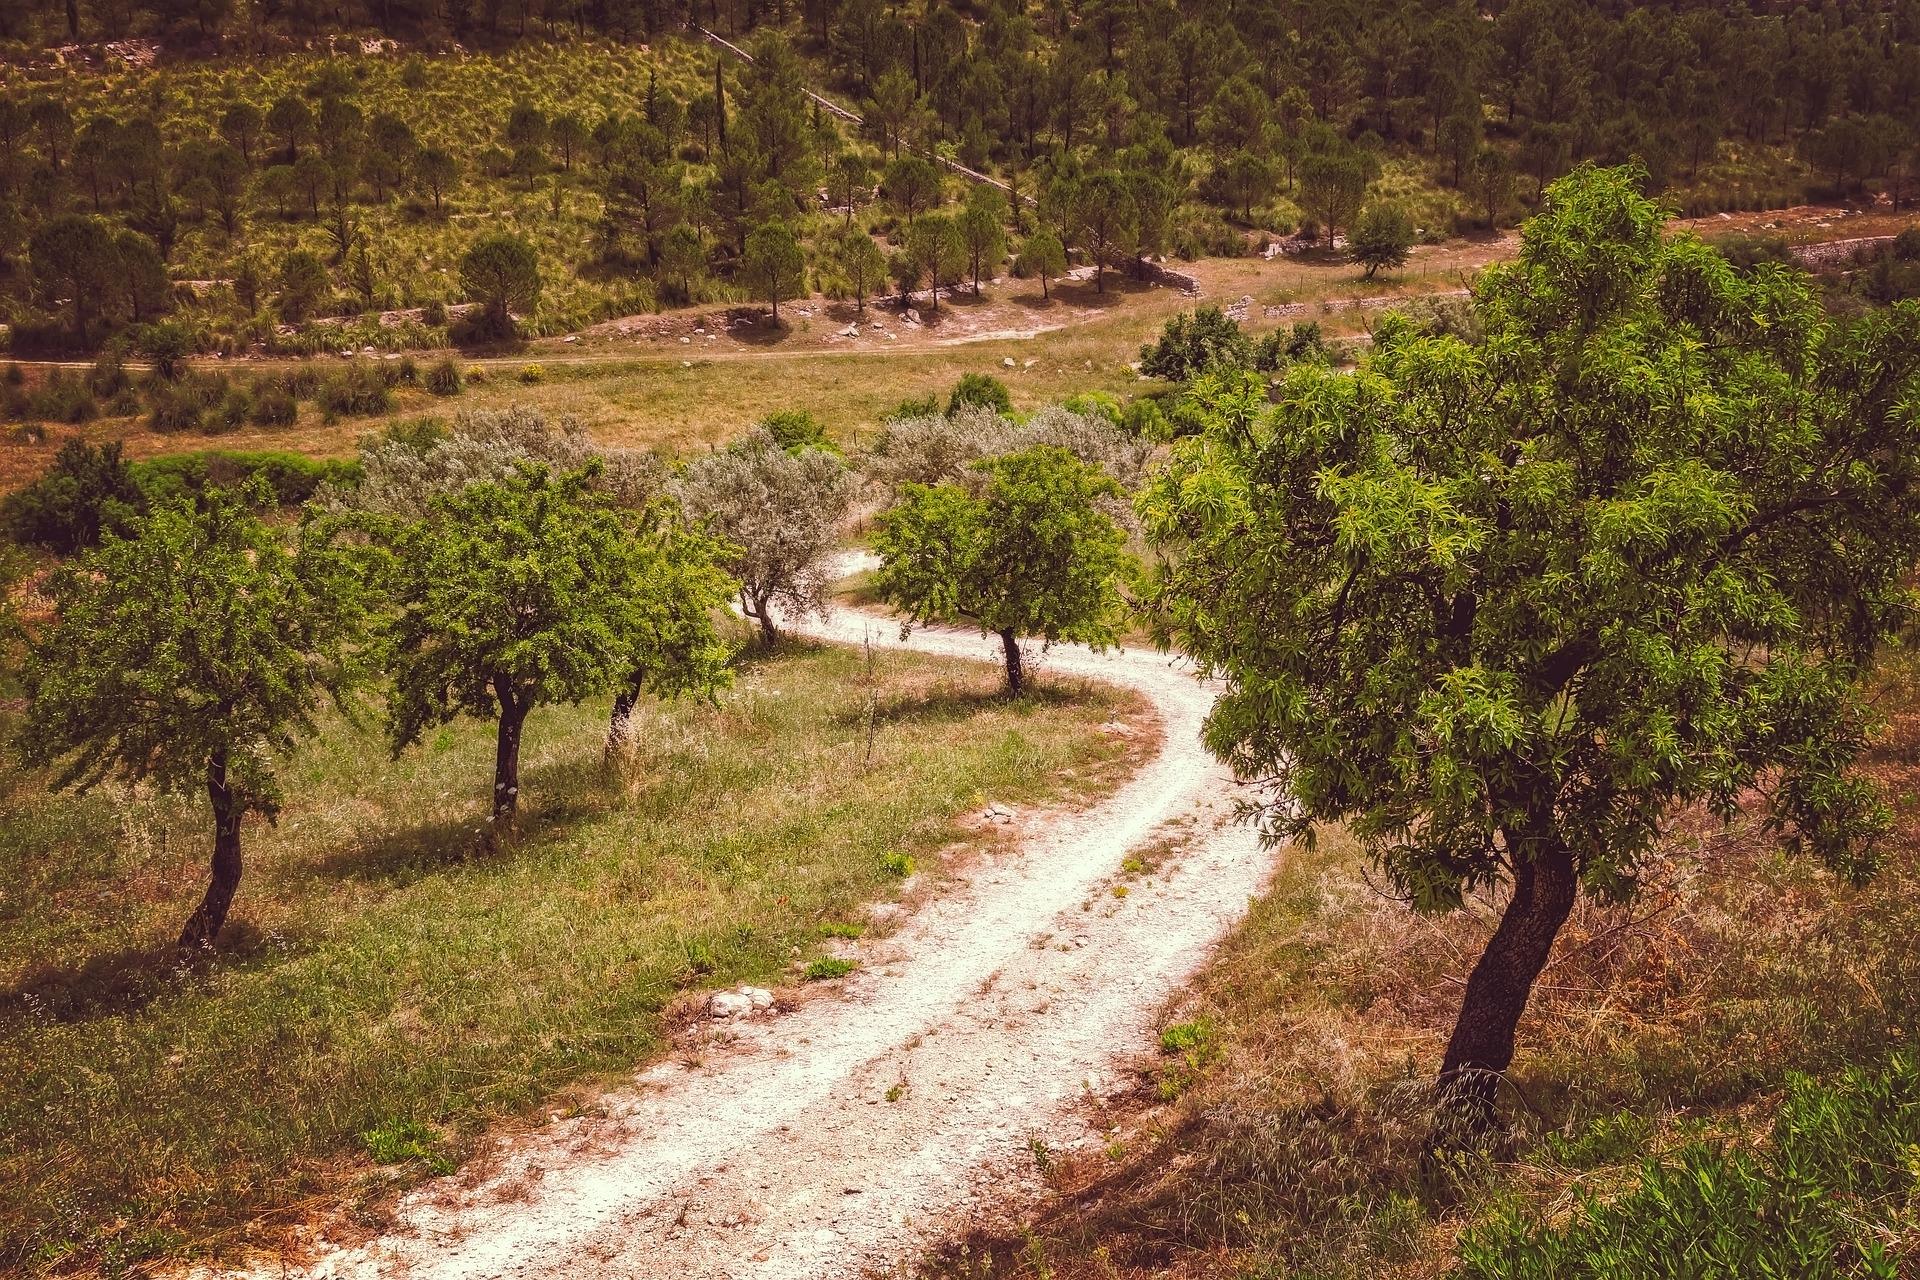 Olijfboomvelden